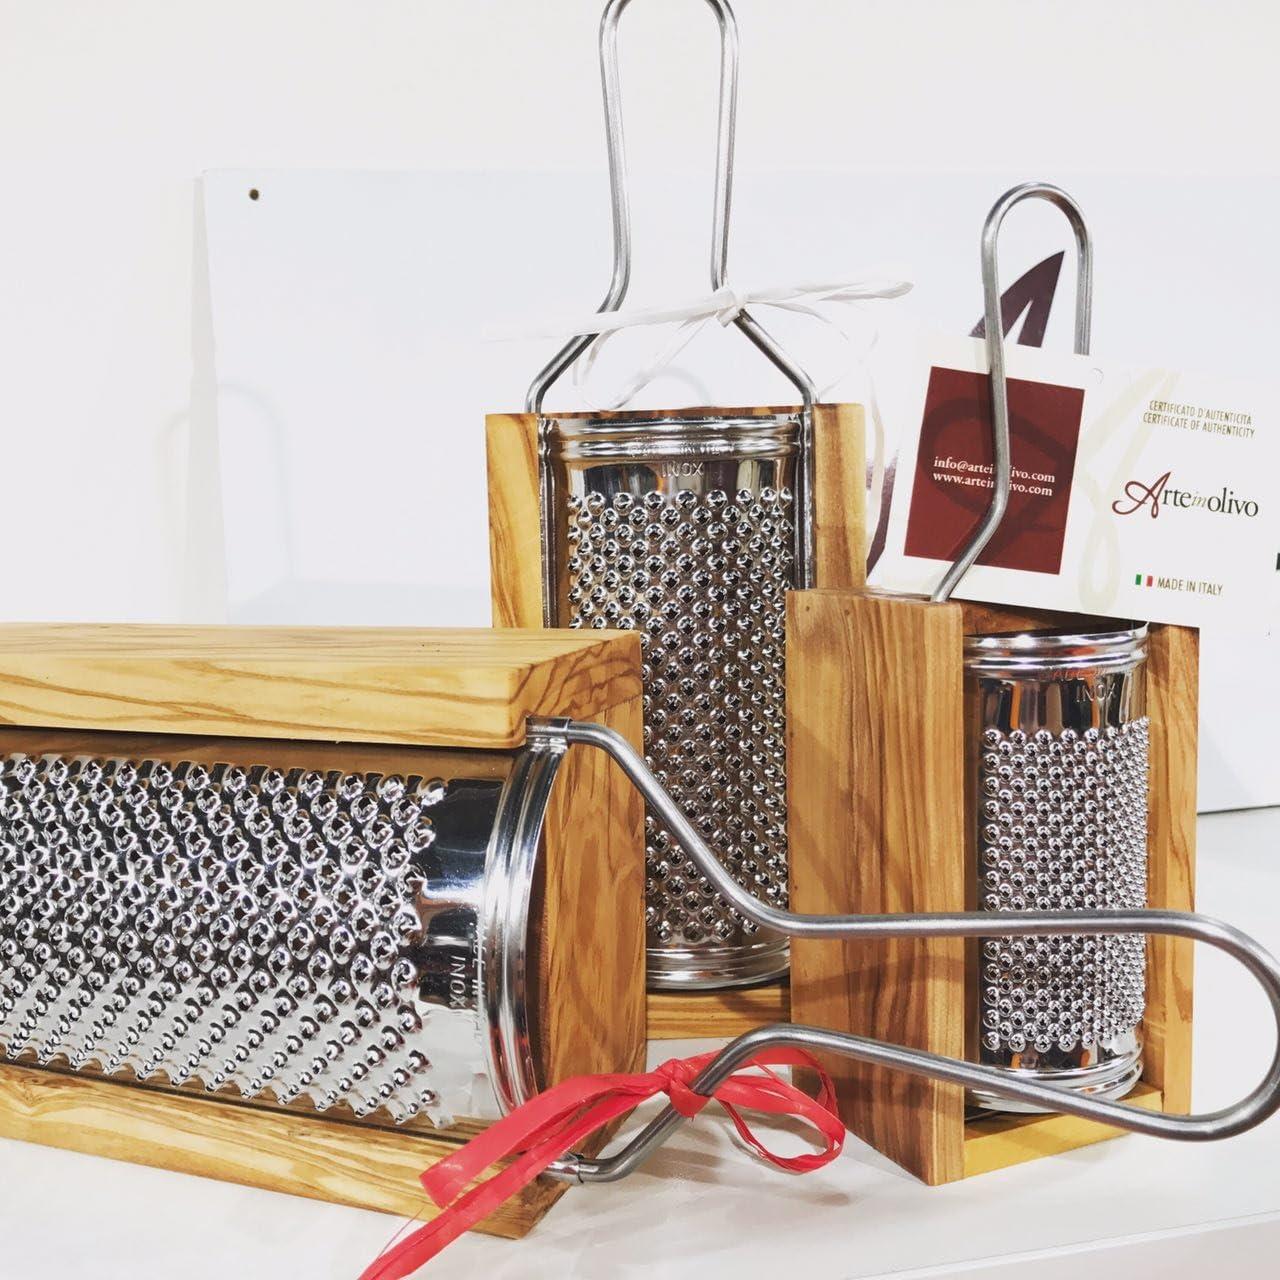 Professional Cooking Grattugia Formaggio parmigiano Tonda MOD Bari in acciao Inox cm.19x6